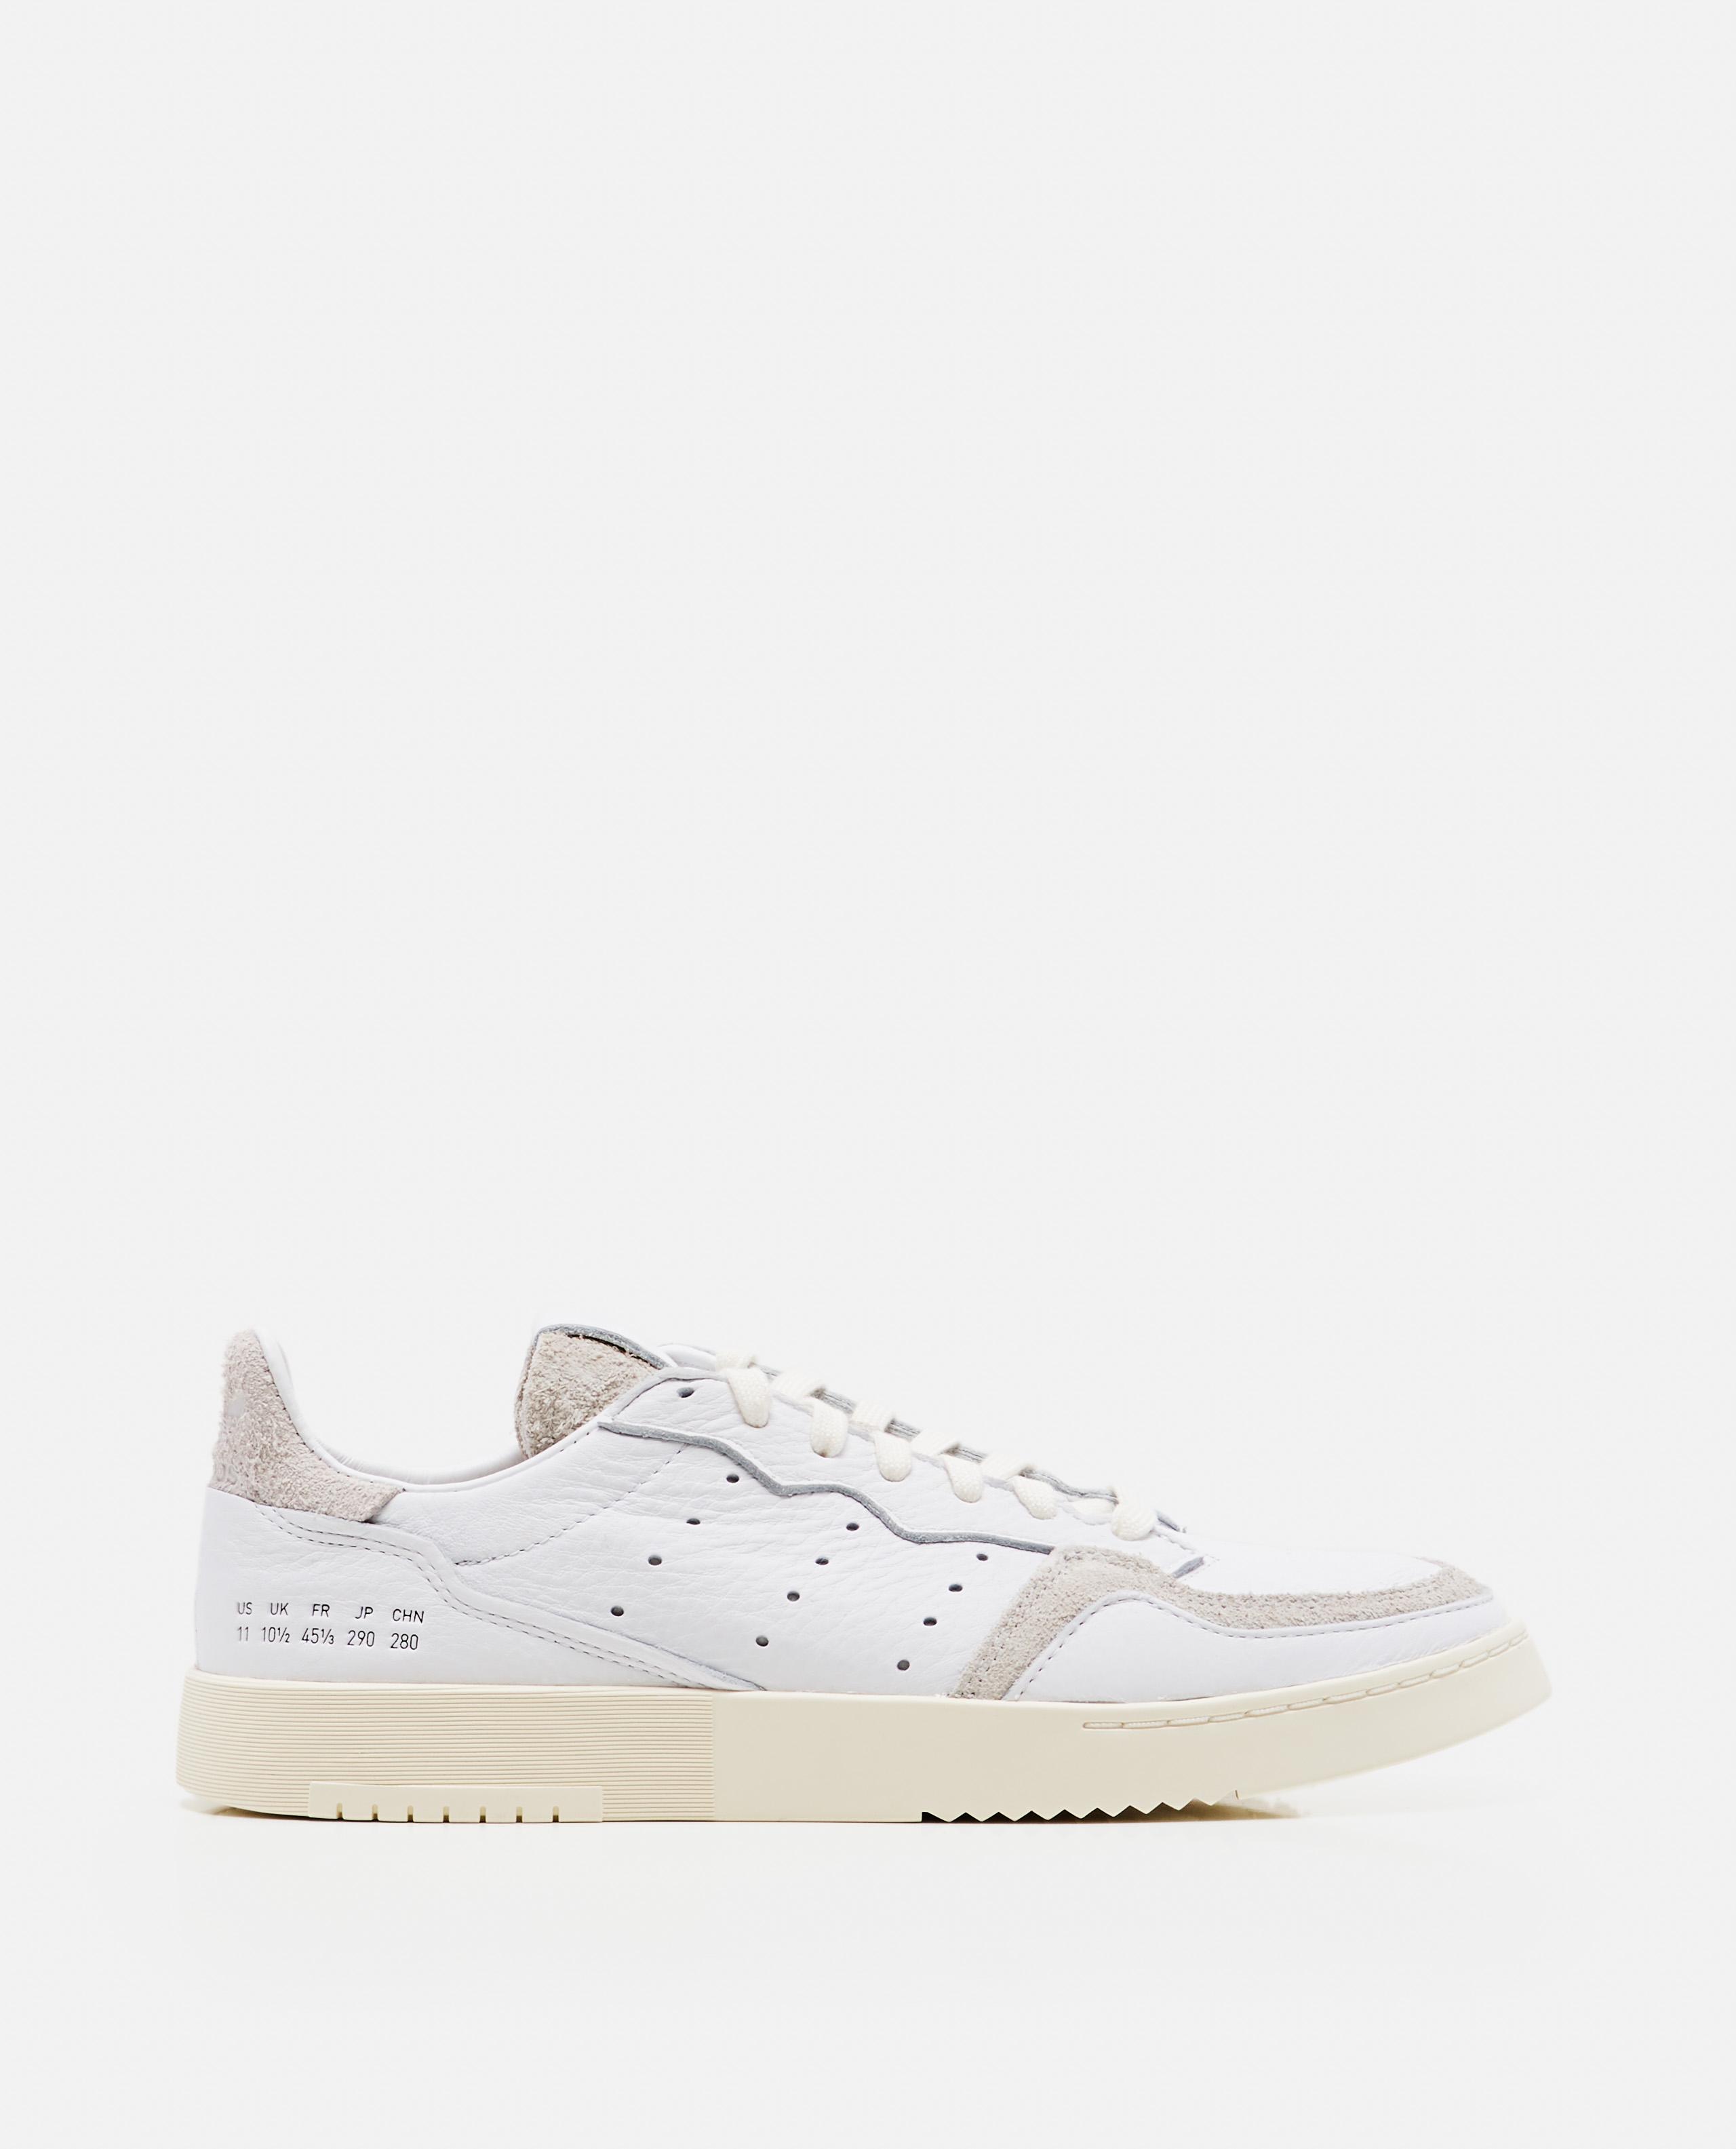 Adidas Originals Supercourt FY0039